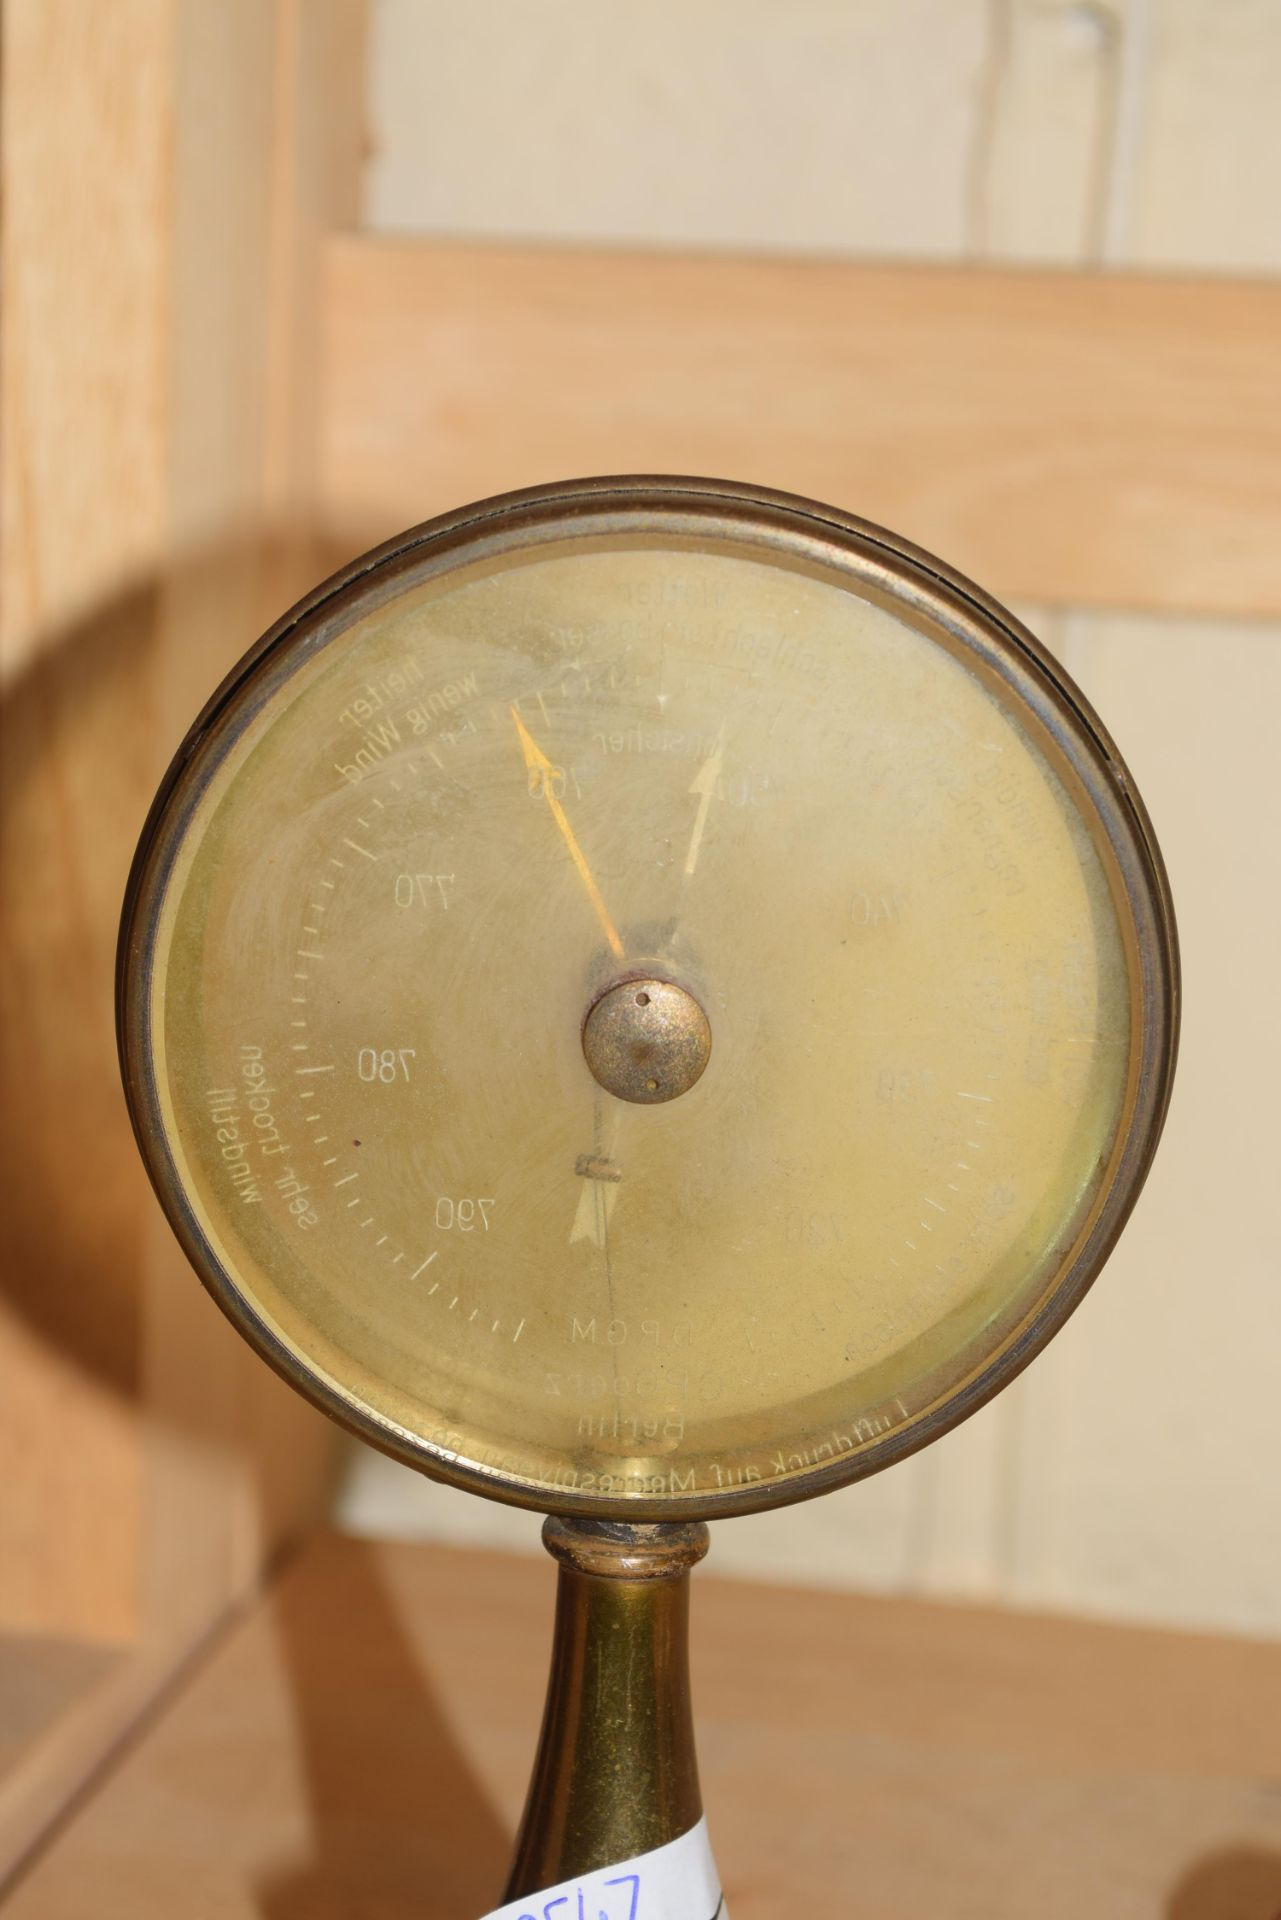 C P Goerz Berlin, early 20th century brass mounted desk barometer, 17cm high - Image 3 of 4